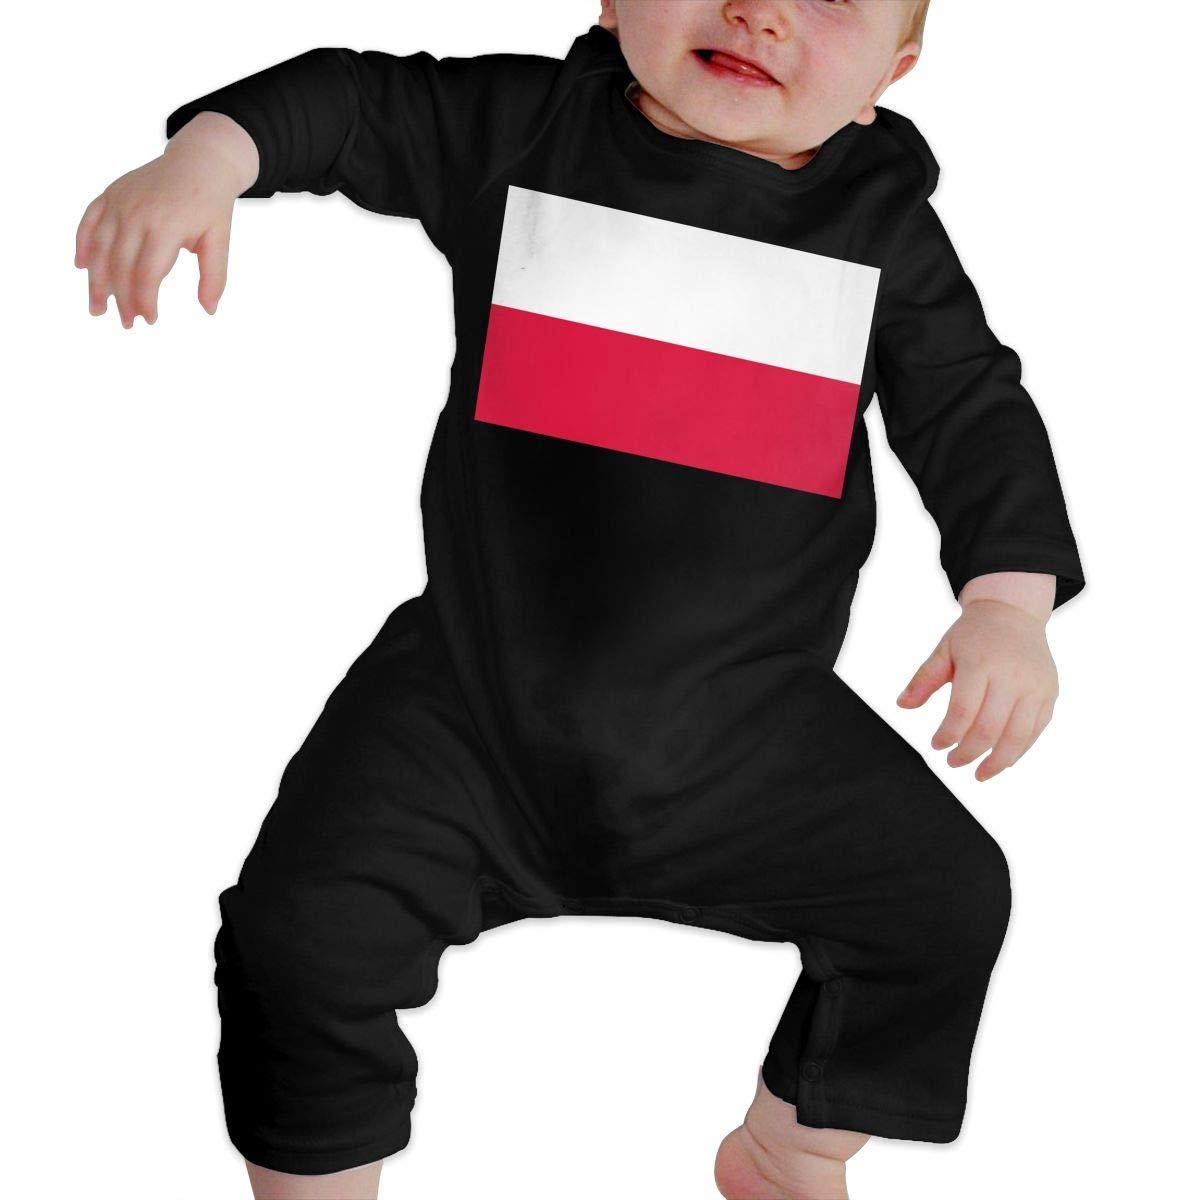 U99oi-9 Long Sleeve Cotton Rompers for Baby Girls Boys Fashion Poland Flag Crawler